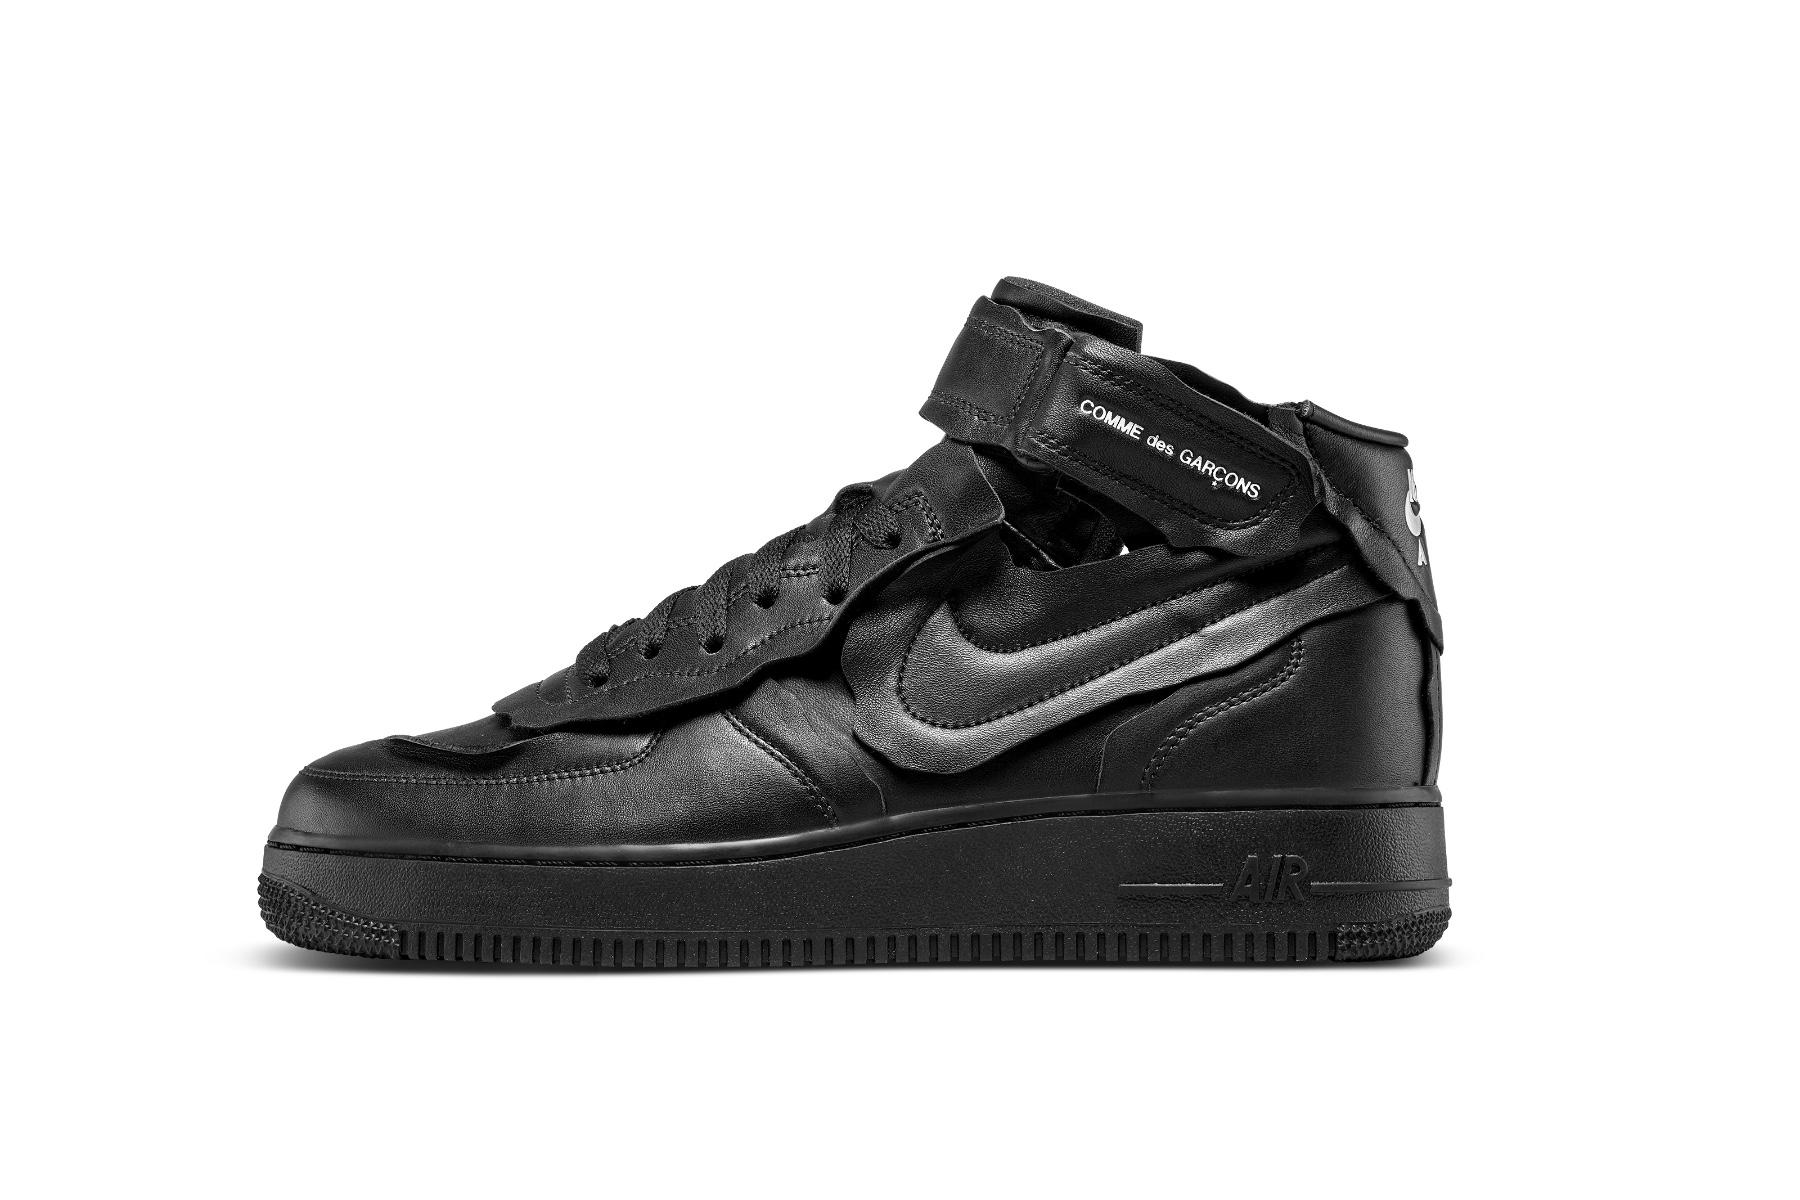 COMME des GARÇONS x Nike Air Force 1 Mid black CDG